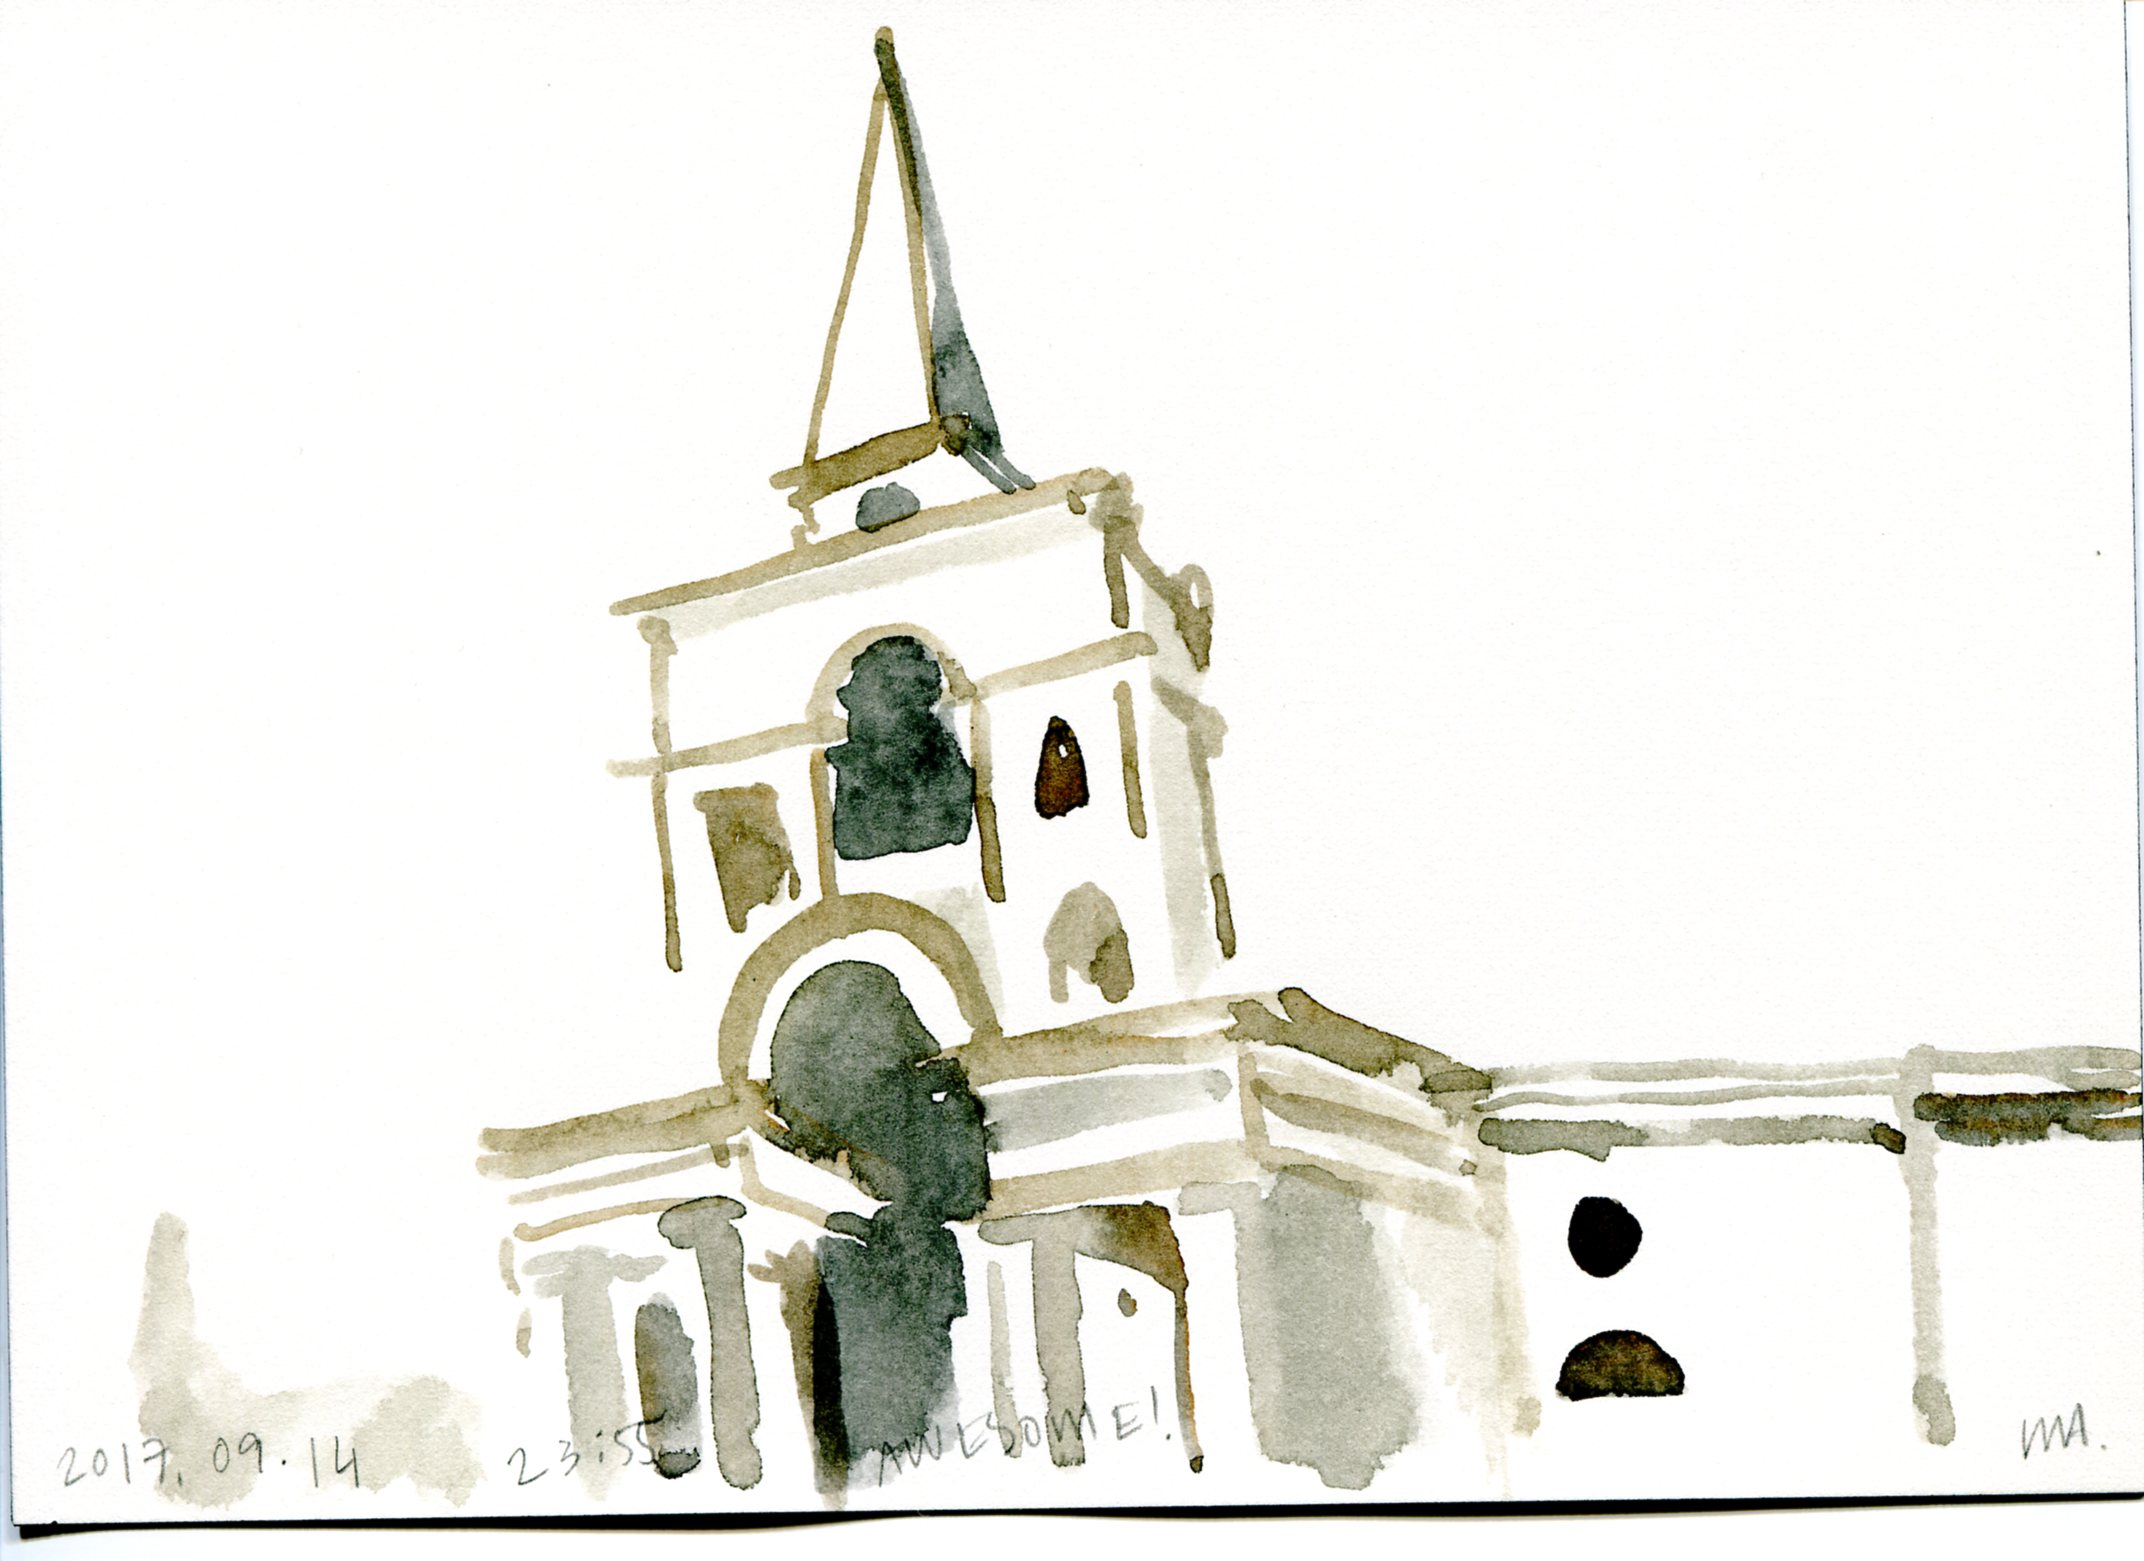 2017-09-17 drawing003.jpg